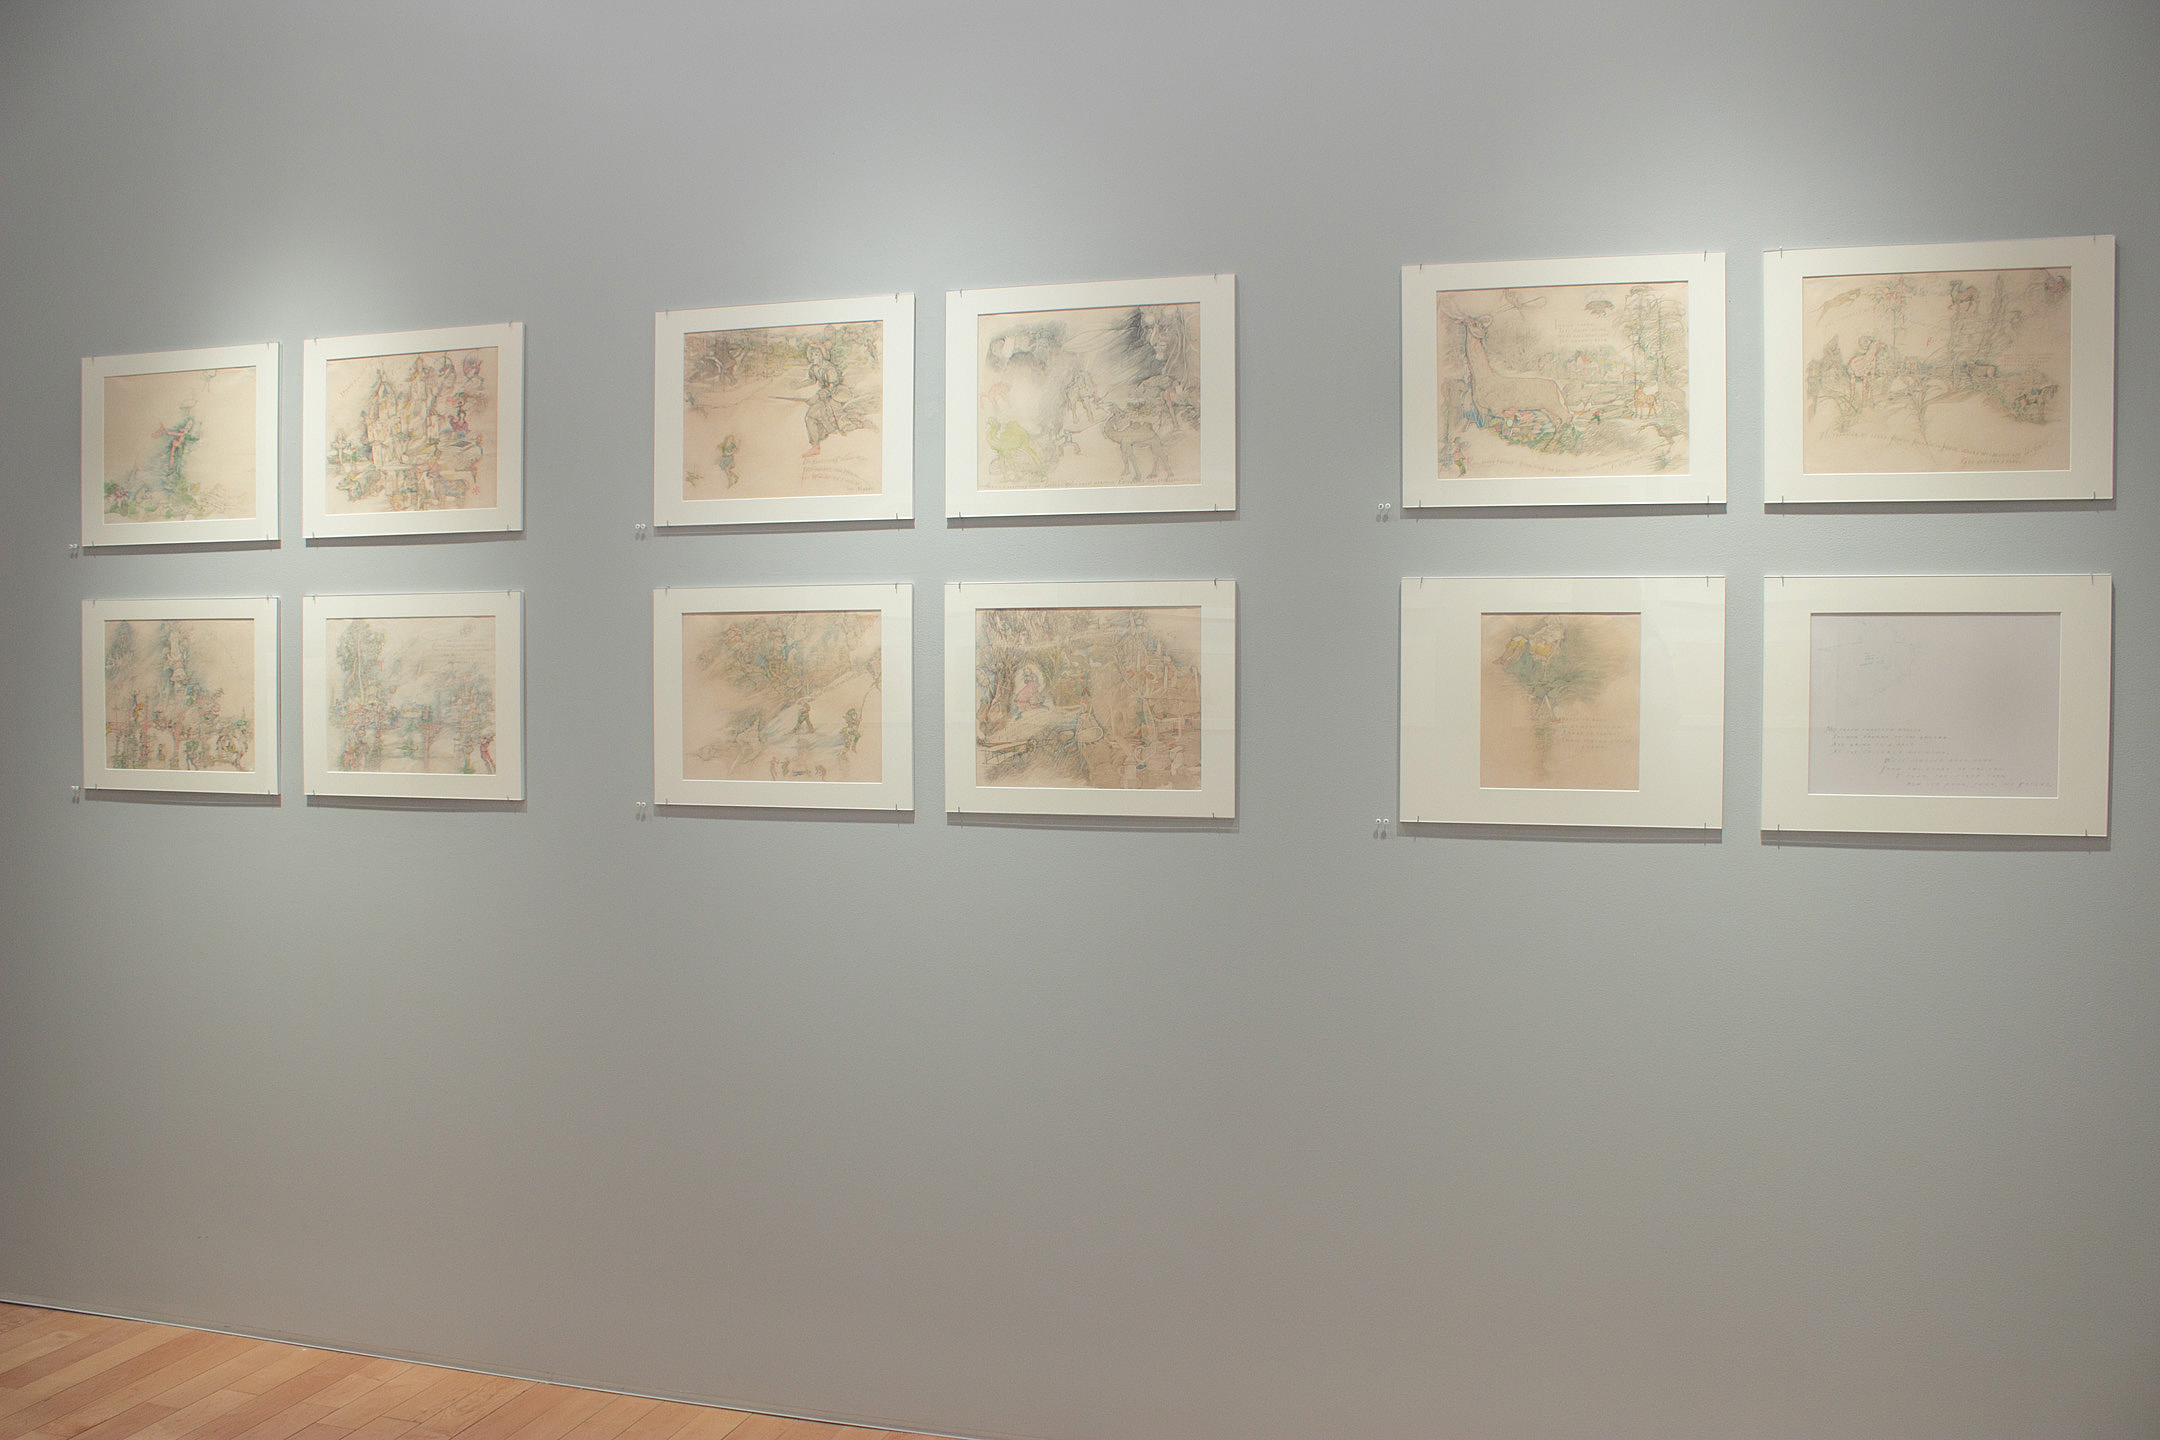 Marvin Bileck: Thimbledon Bridge   Emily Nelligan: Drawings